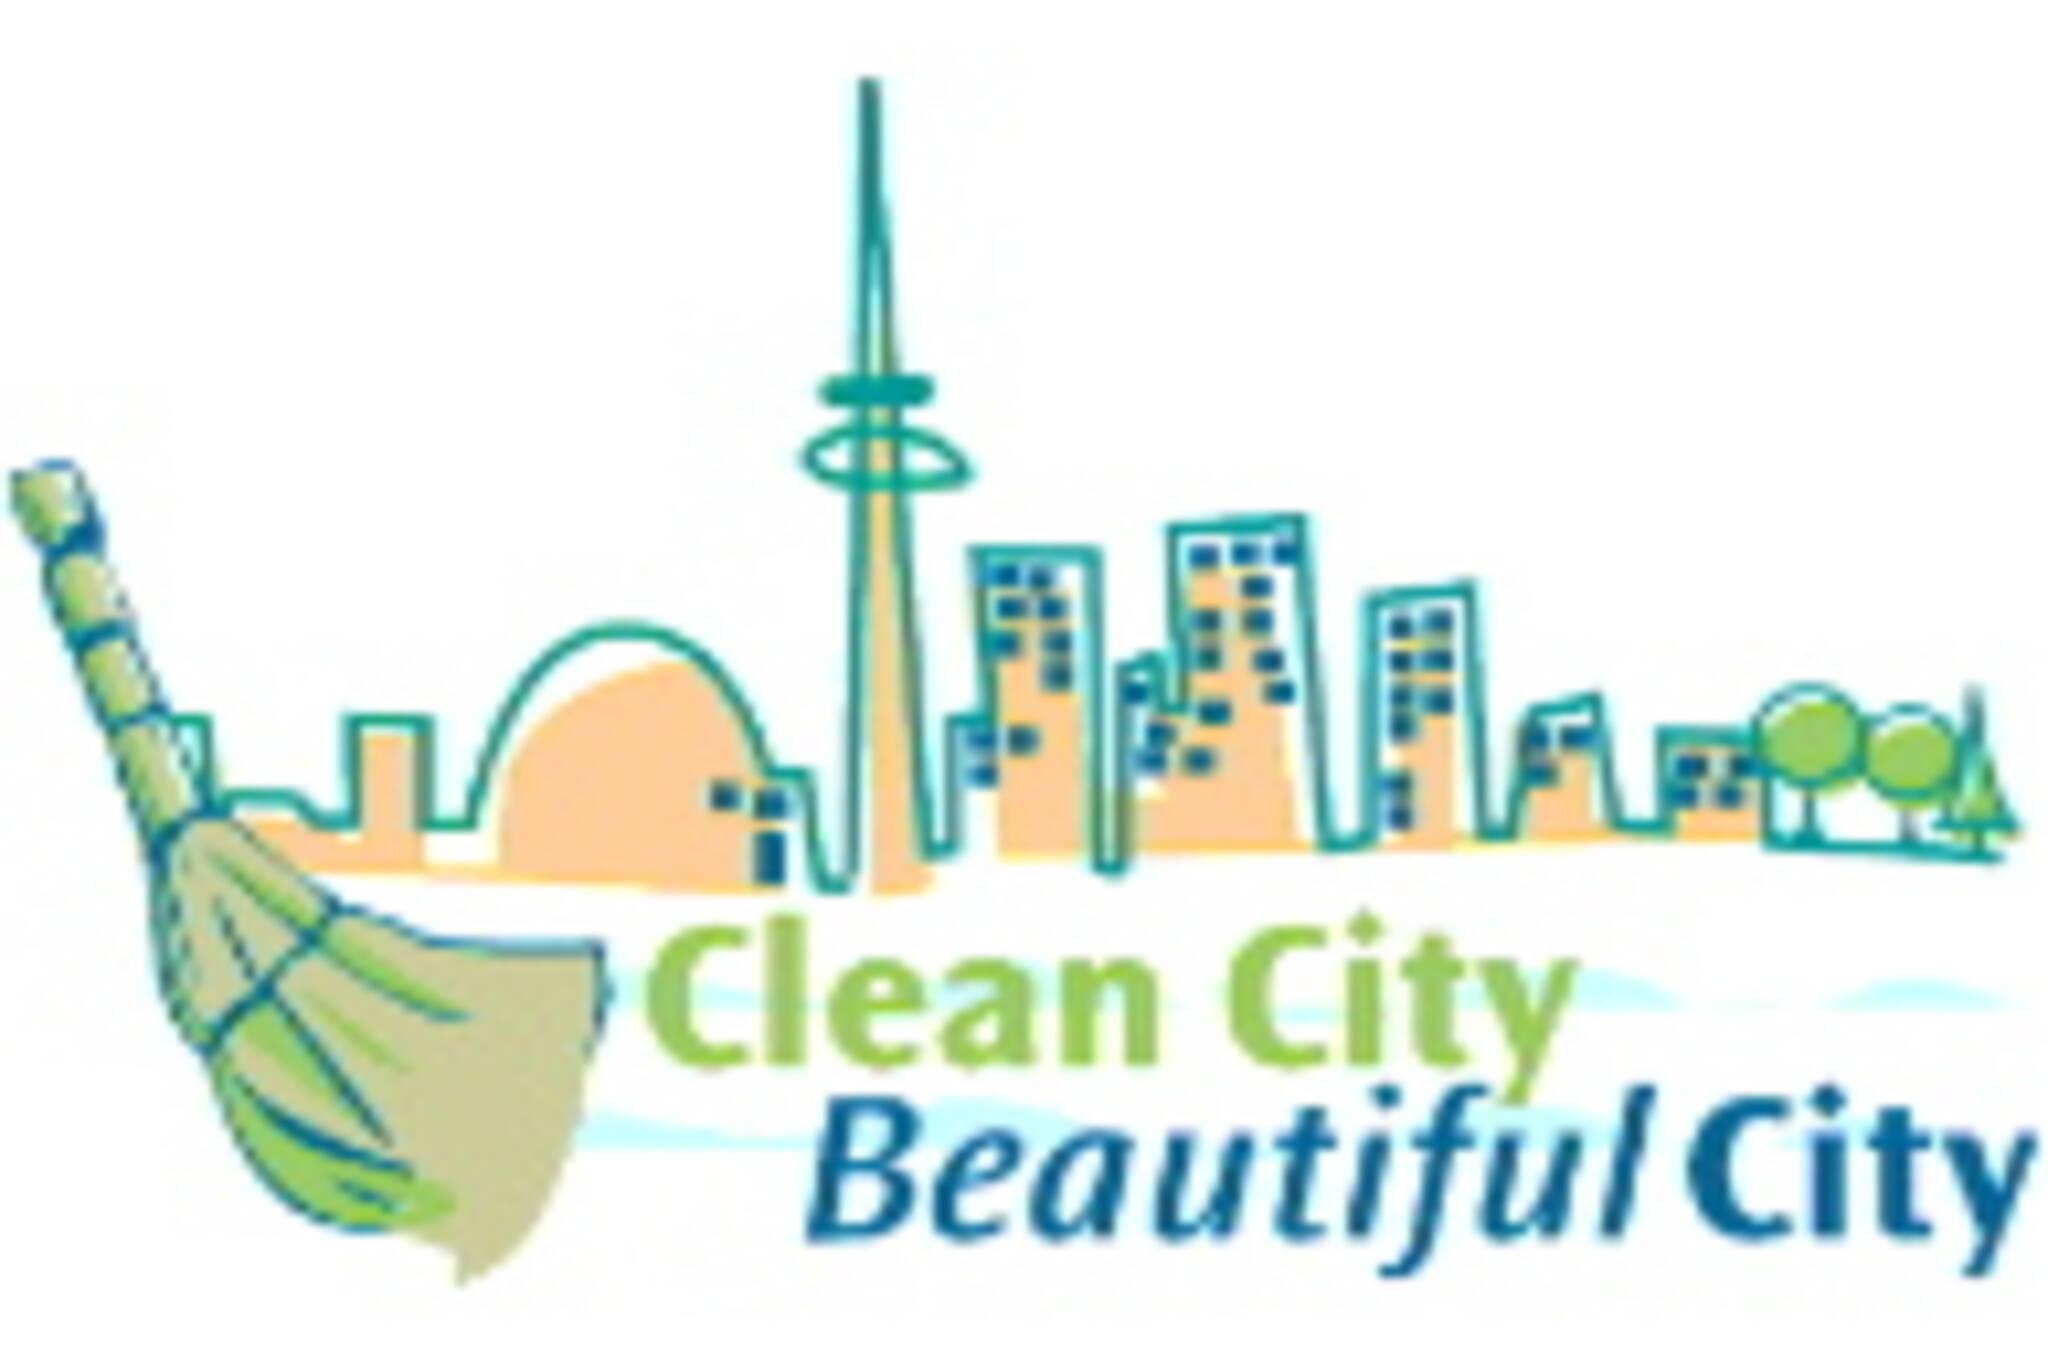 cleanandbeautiful_logo_large.JPG